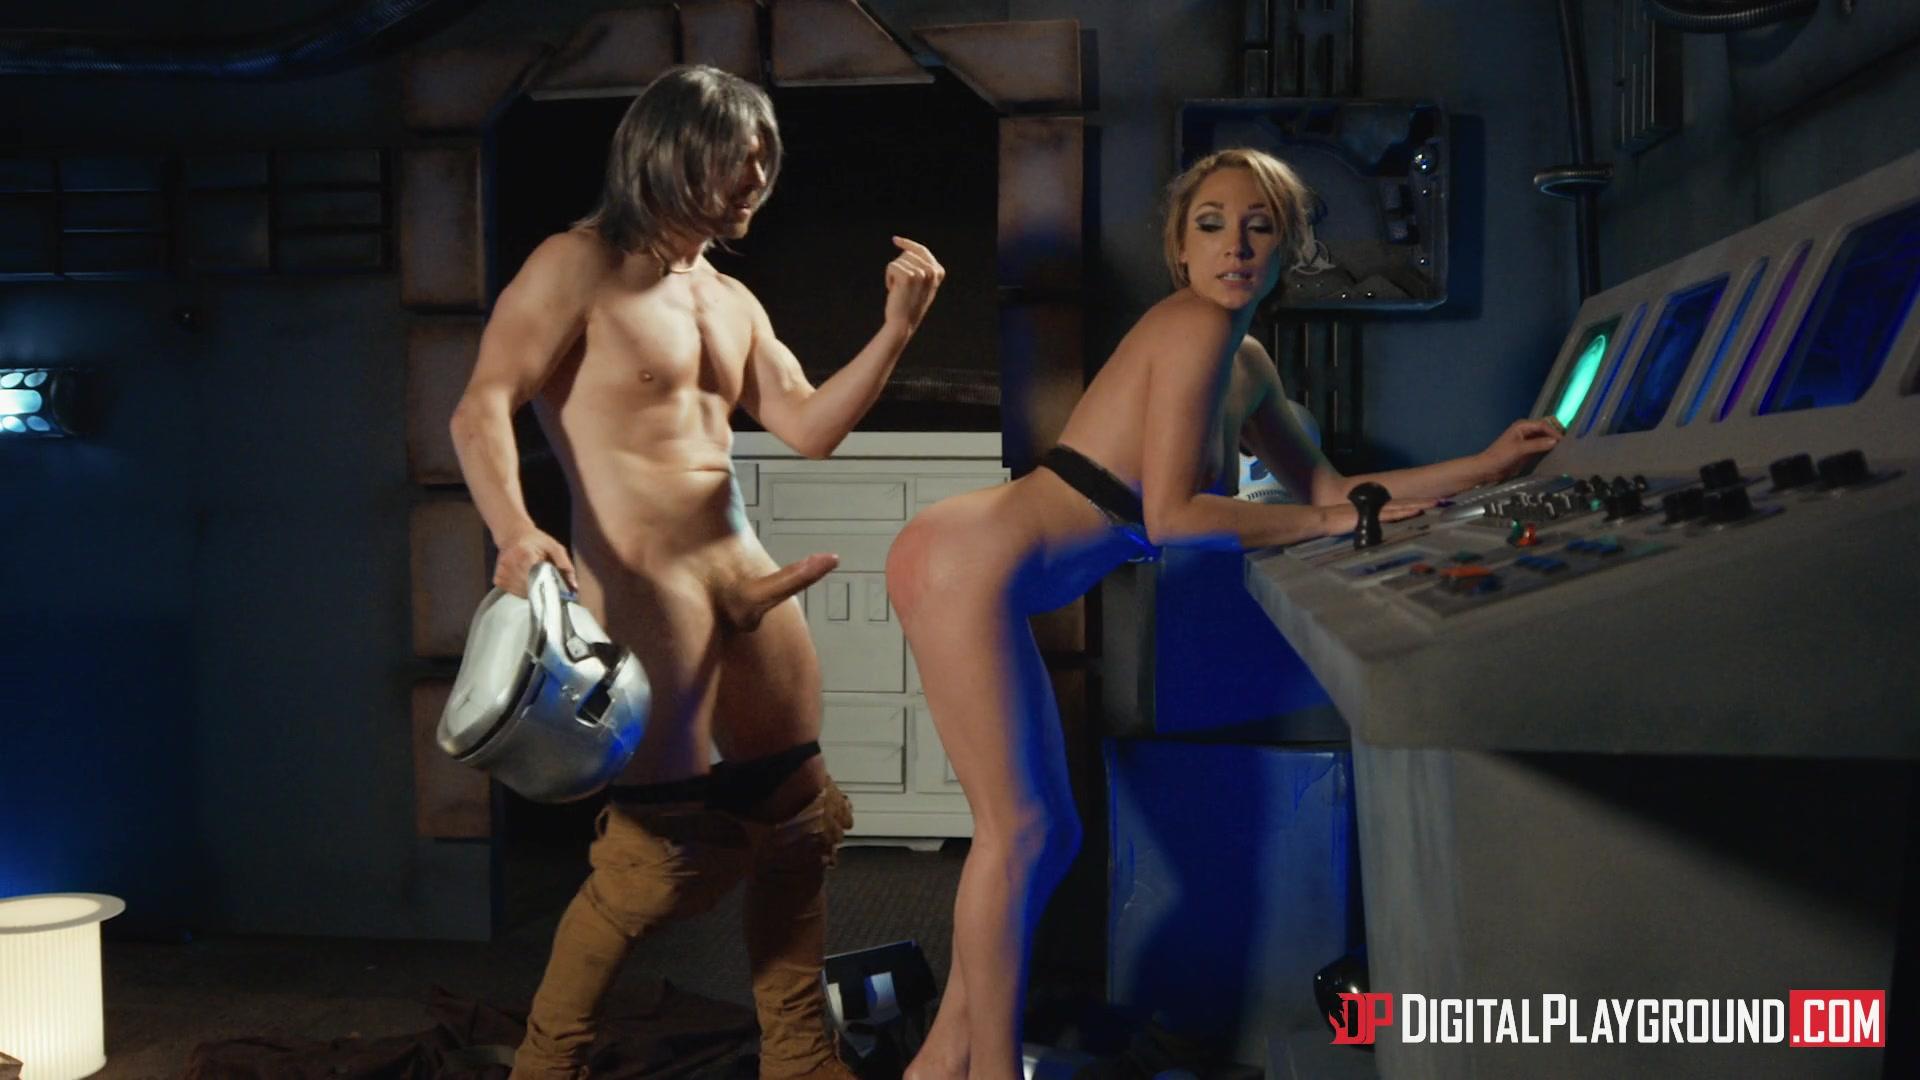 Free Vr Porn Pics